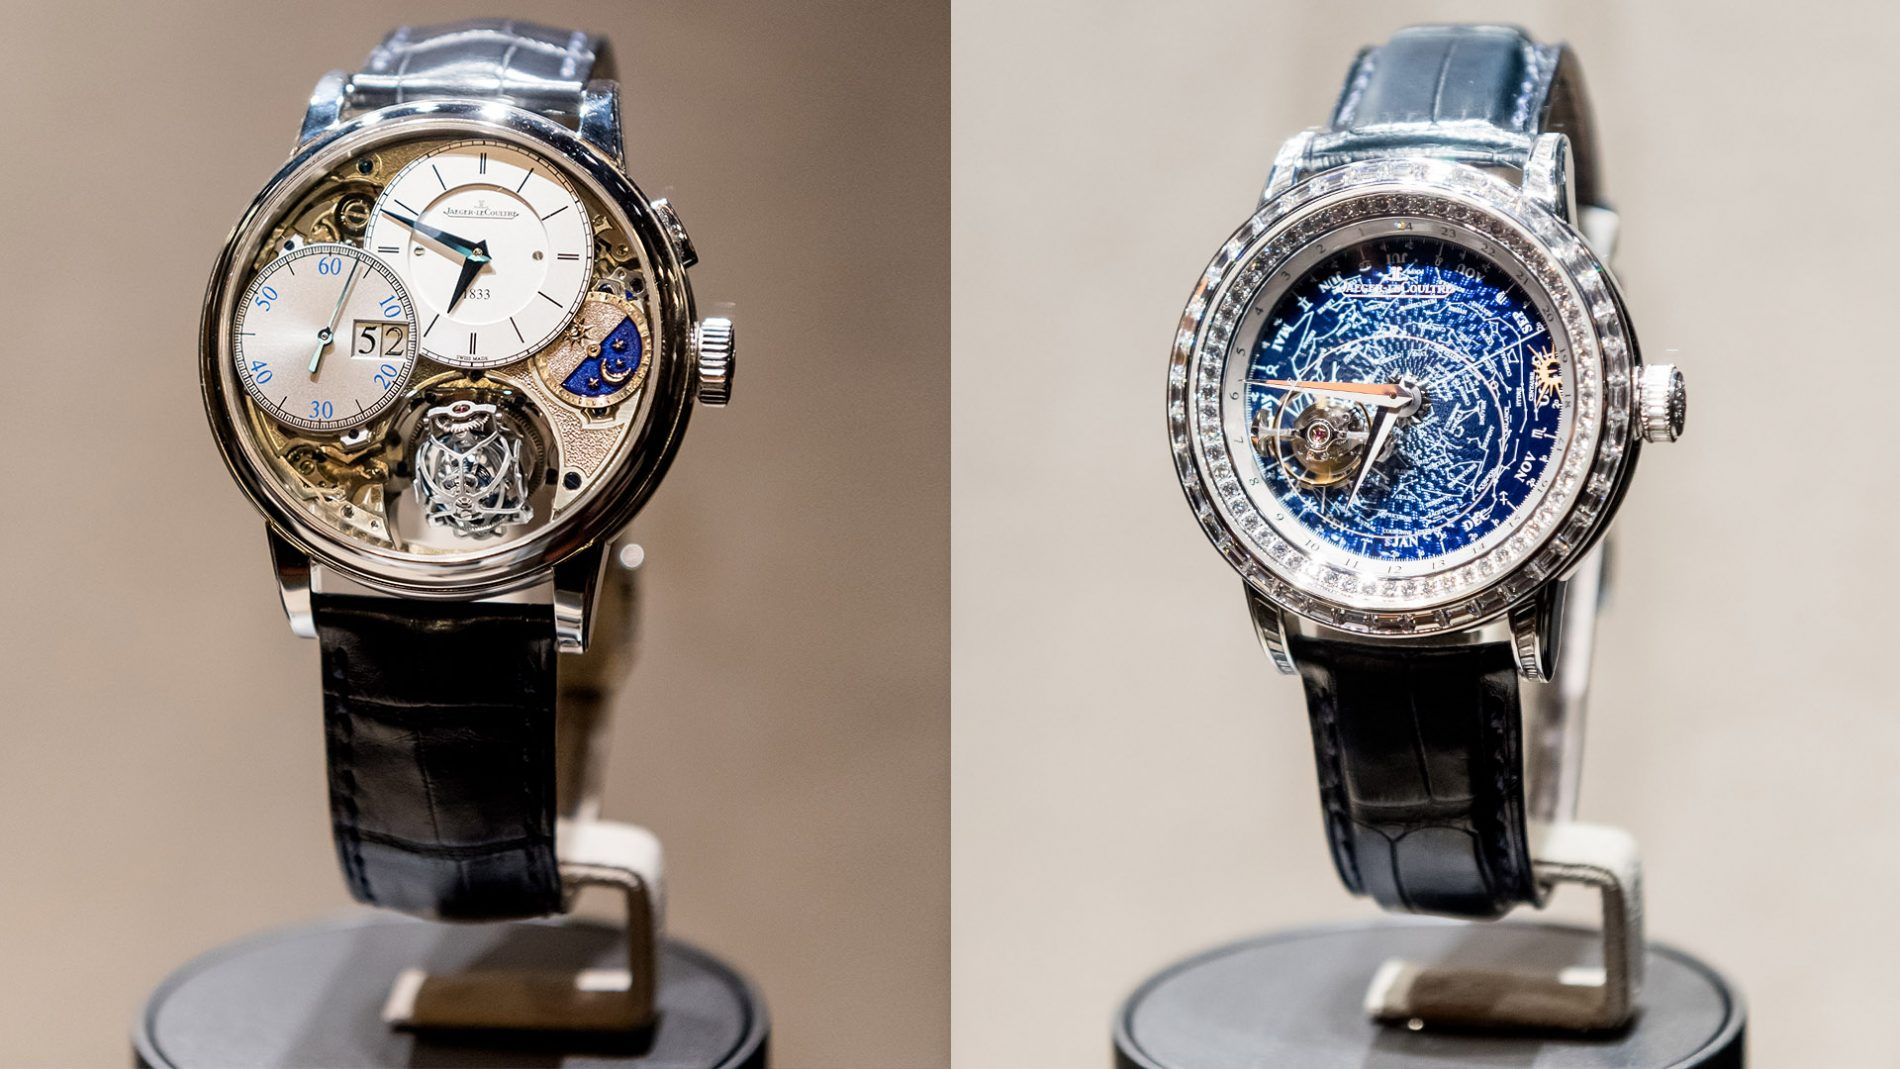 El Corte Inglés Diseñador Relojes Lujo Chronograph Jaeger-LeCoultre